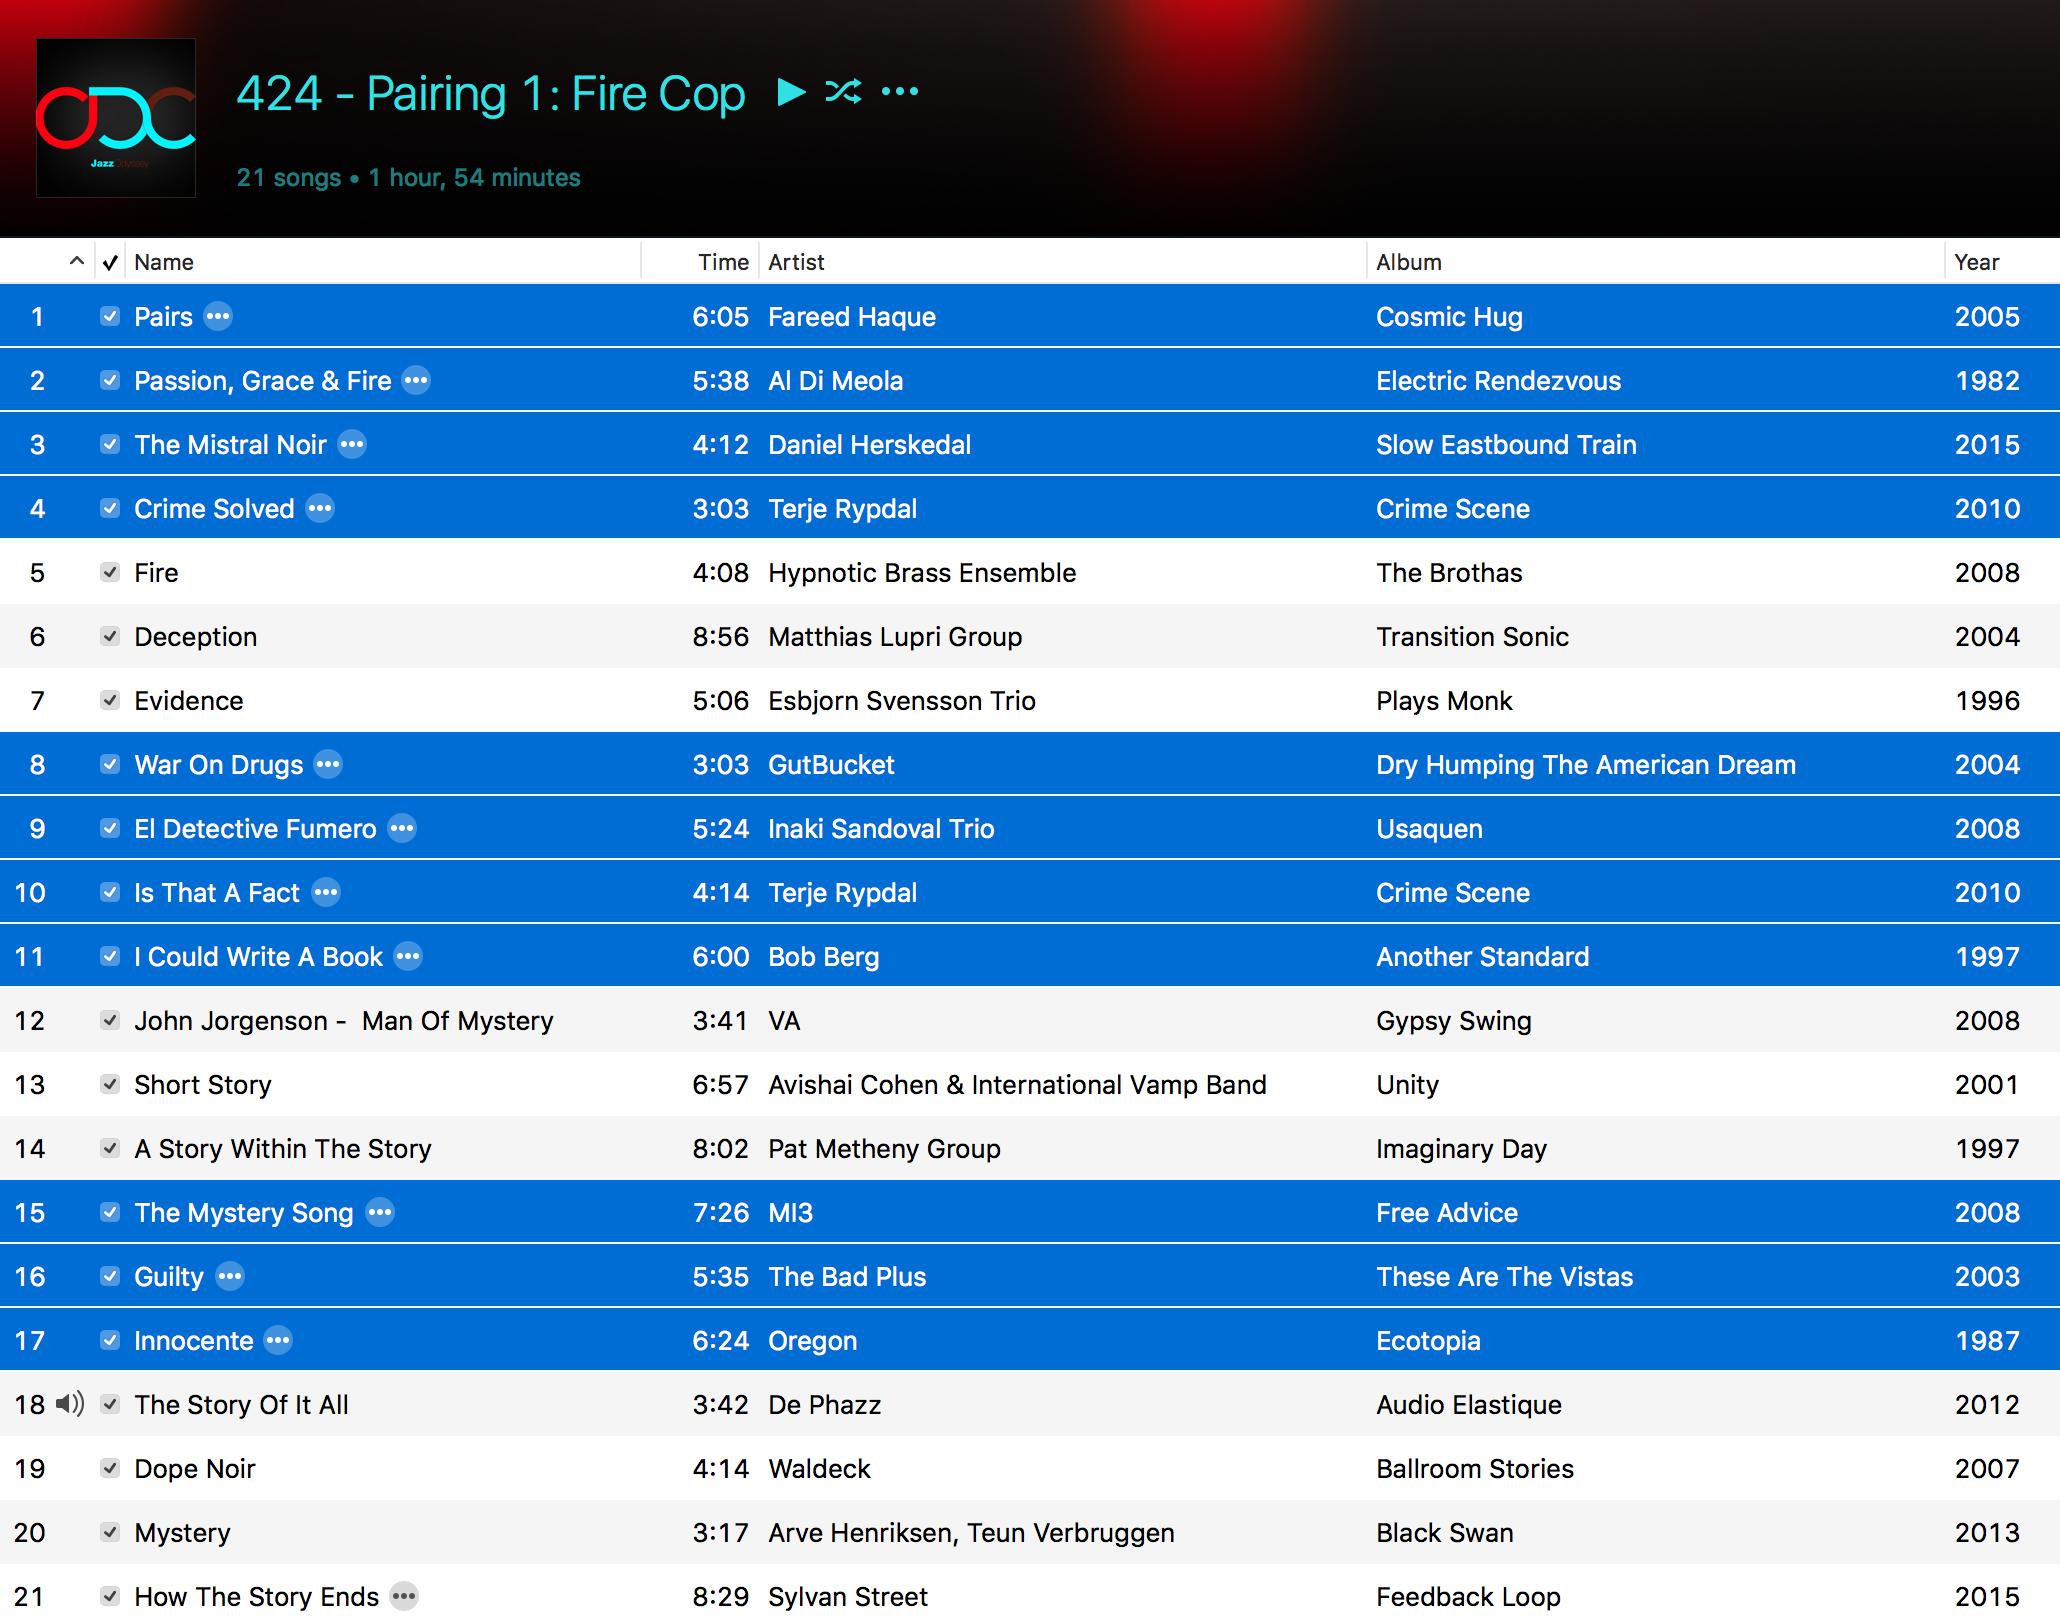 Jazz ODC #424 - Pairing 1 - Fire Cop - Playlist